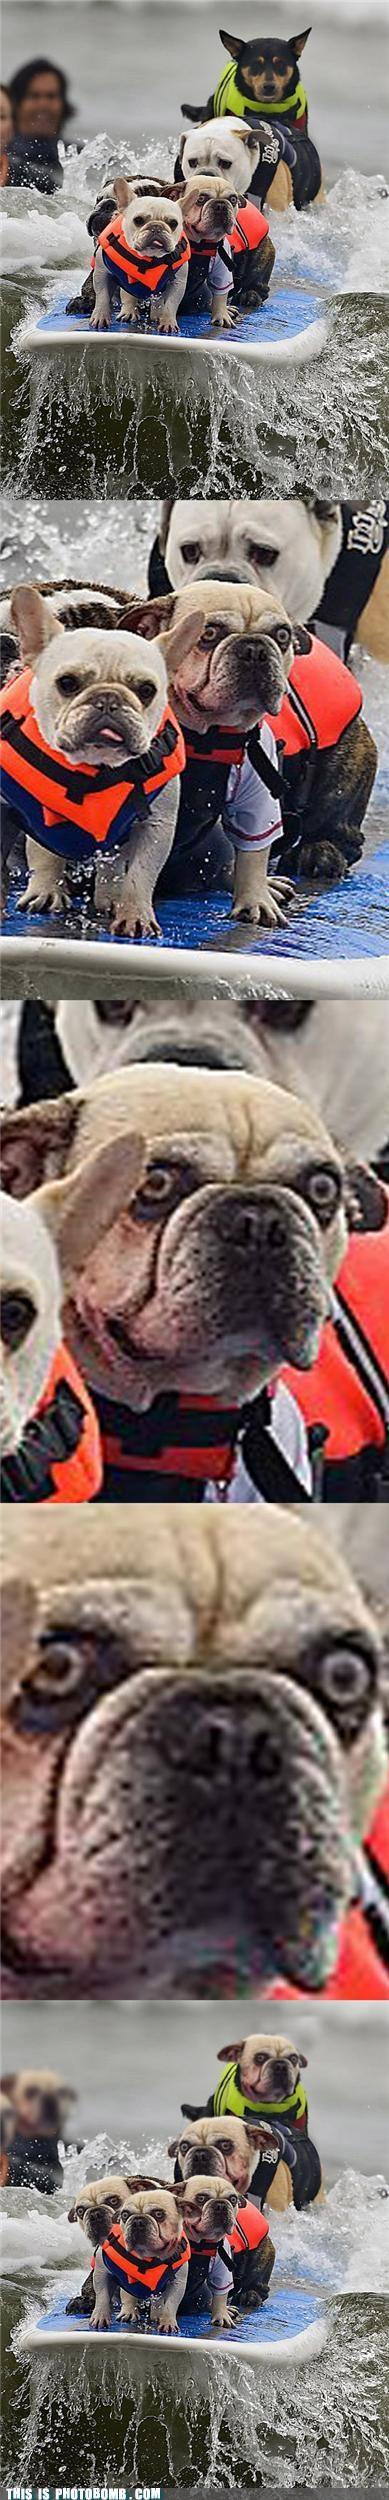 Animal Bomb,animals,best of week,cerberus,dogs,Reframe,surfing